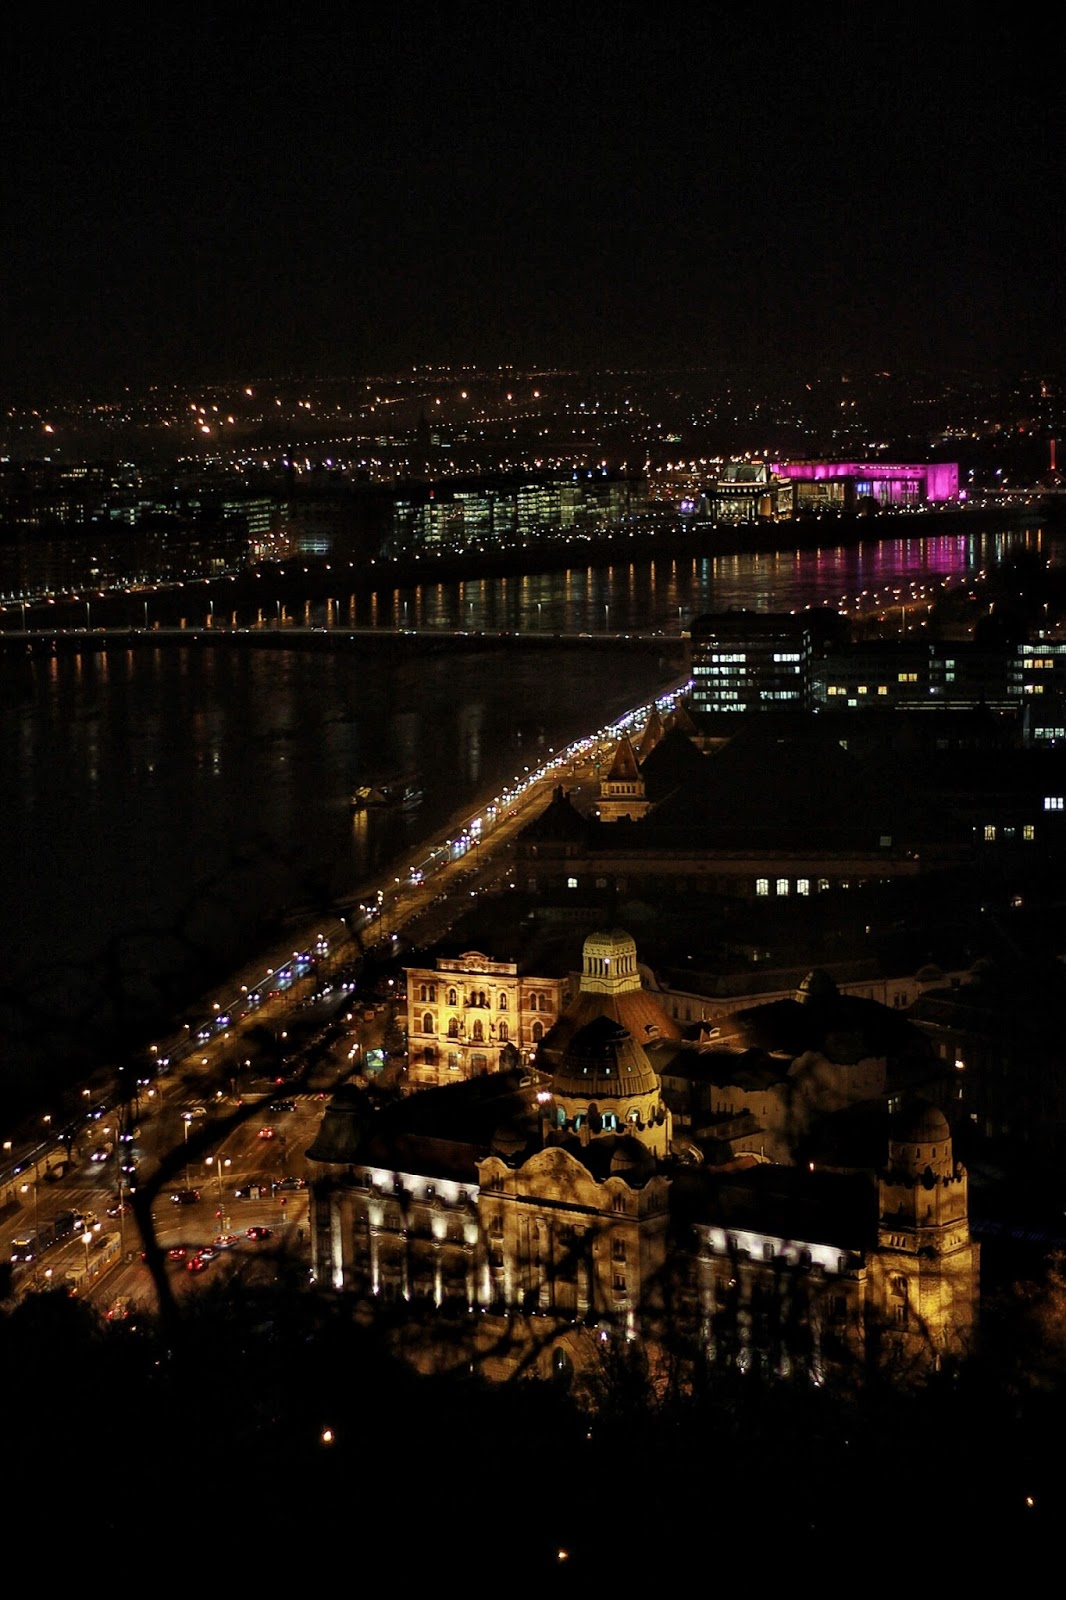 lifesthayle-budapest-citadella-view-at-night.JPG